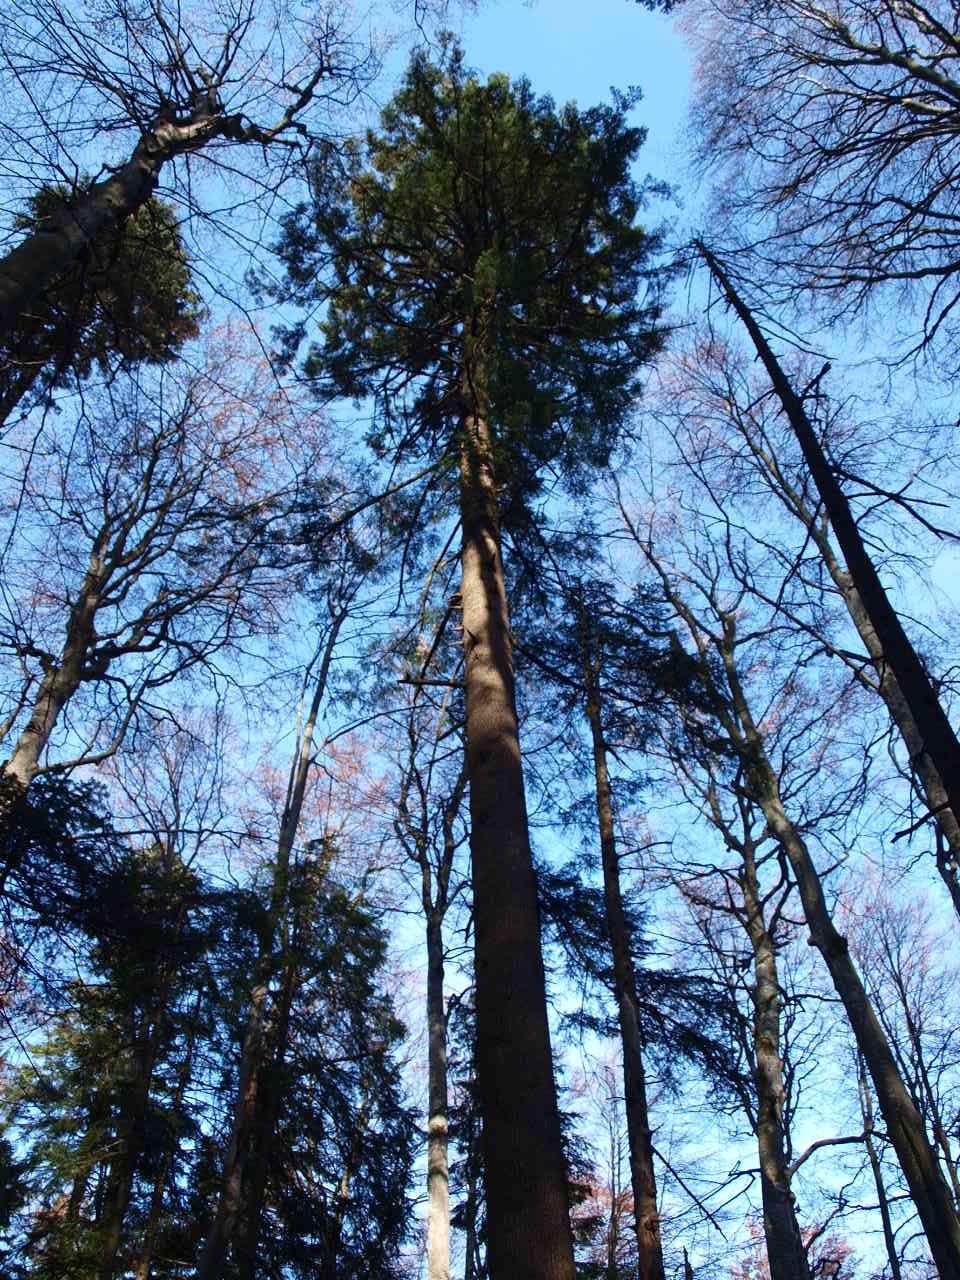 Cel mai înalt brad nedoborât măsurat în România